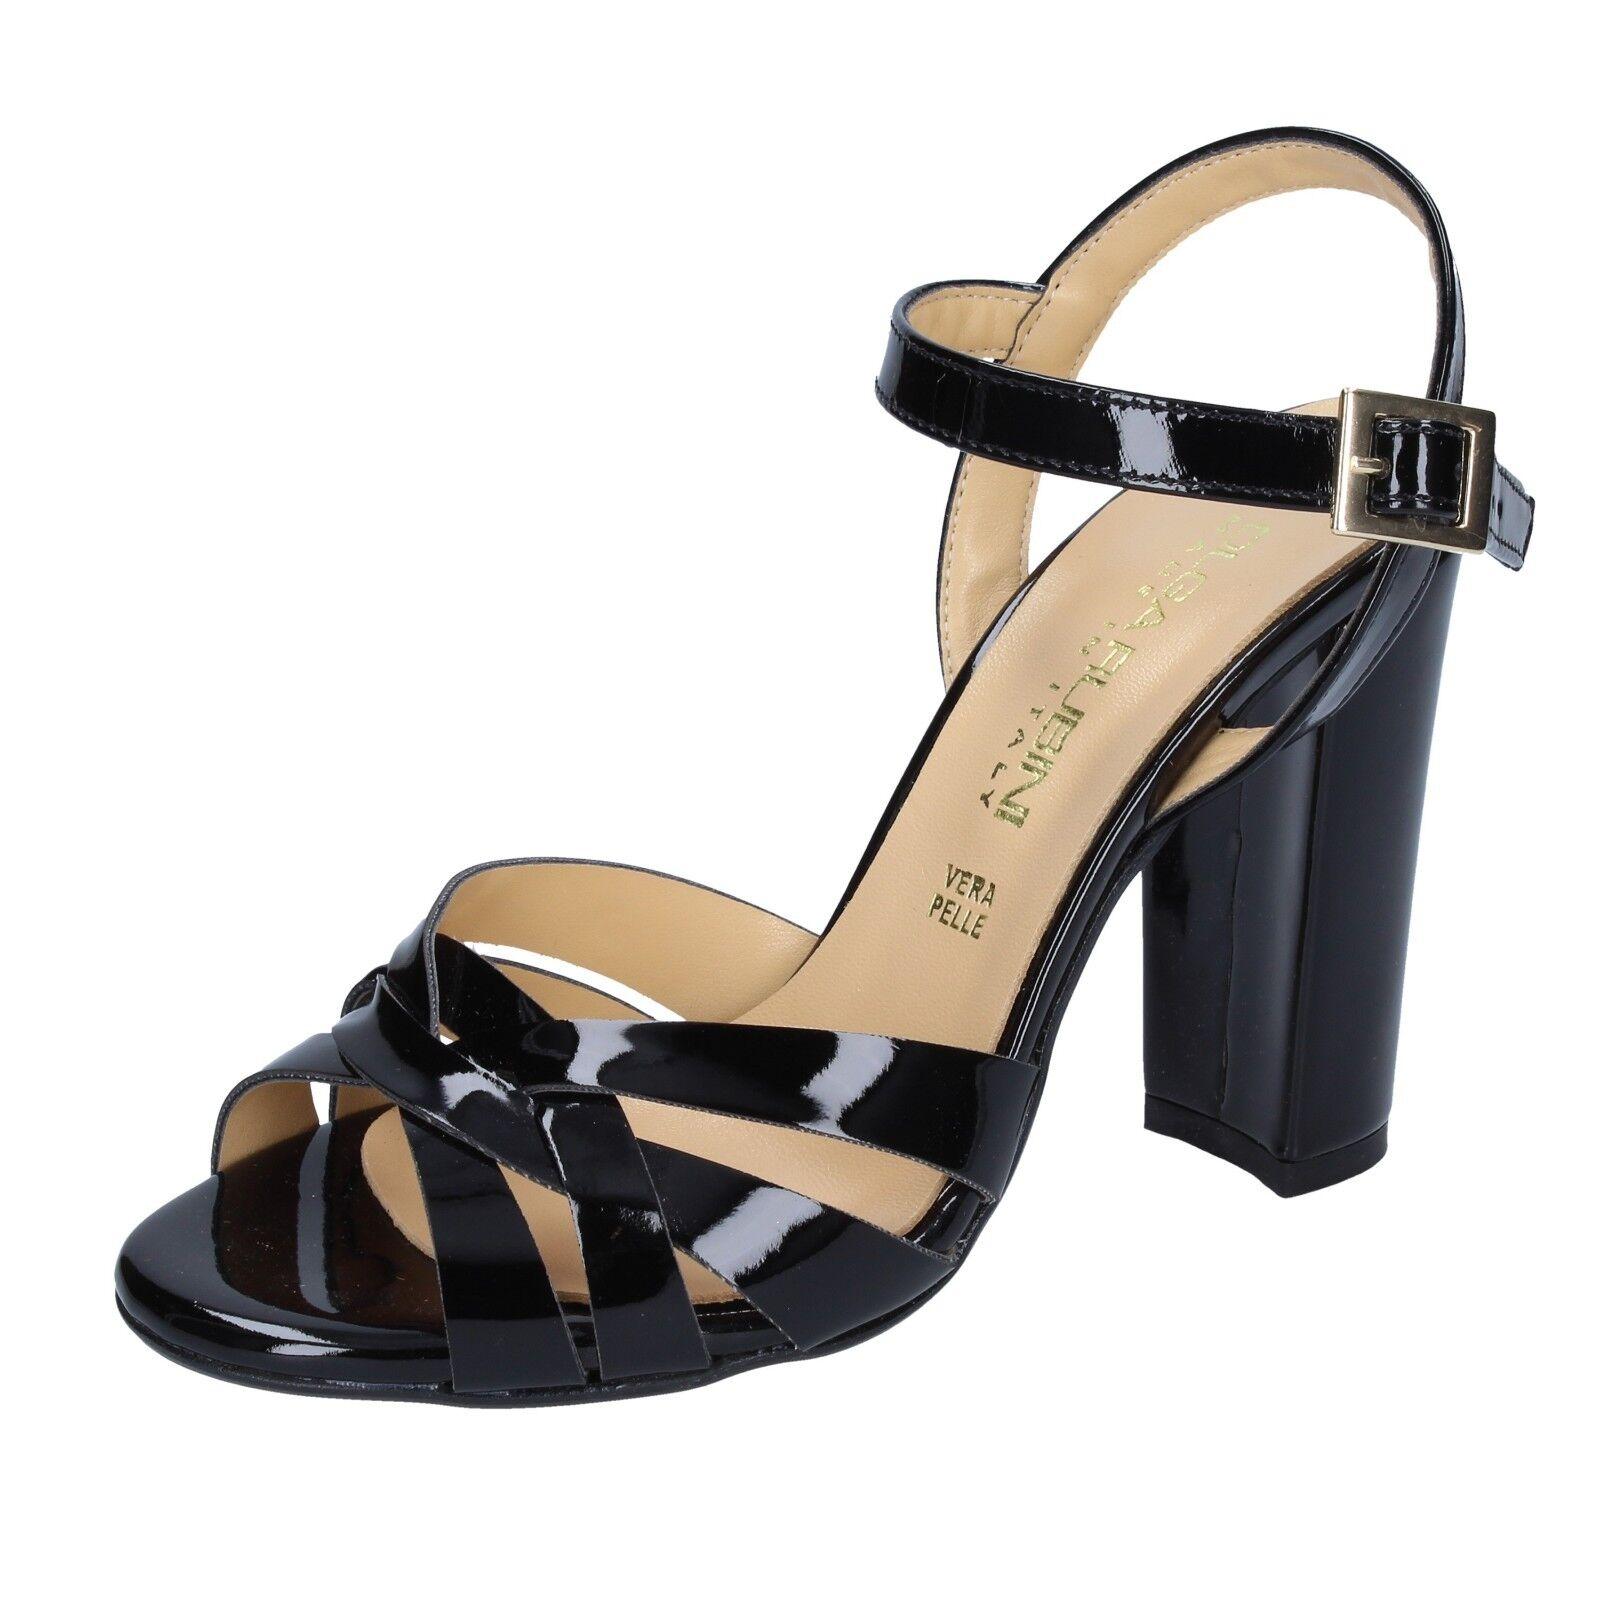 Zapatos señora olga Burini 37 UE sandalias sandalias sandalias negro charol bs115-37  alta calidad